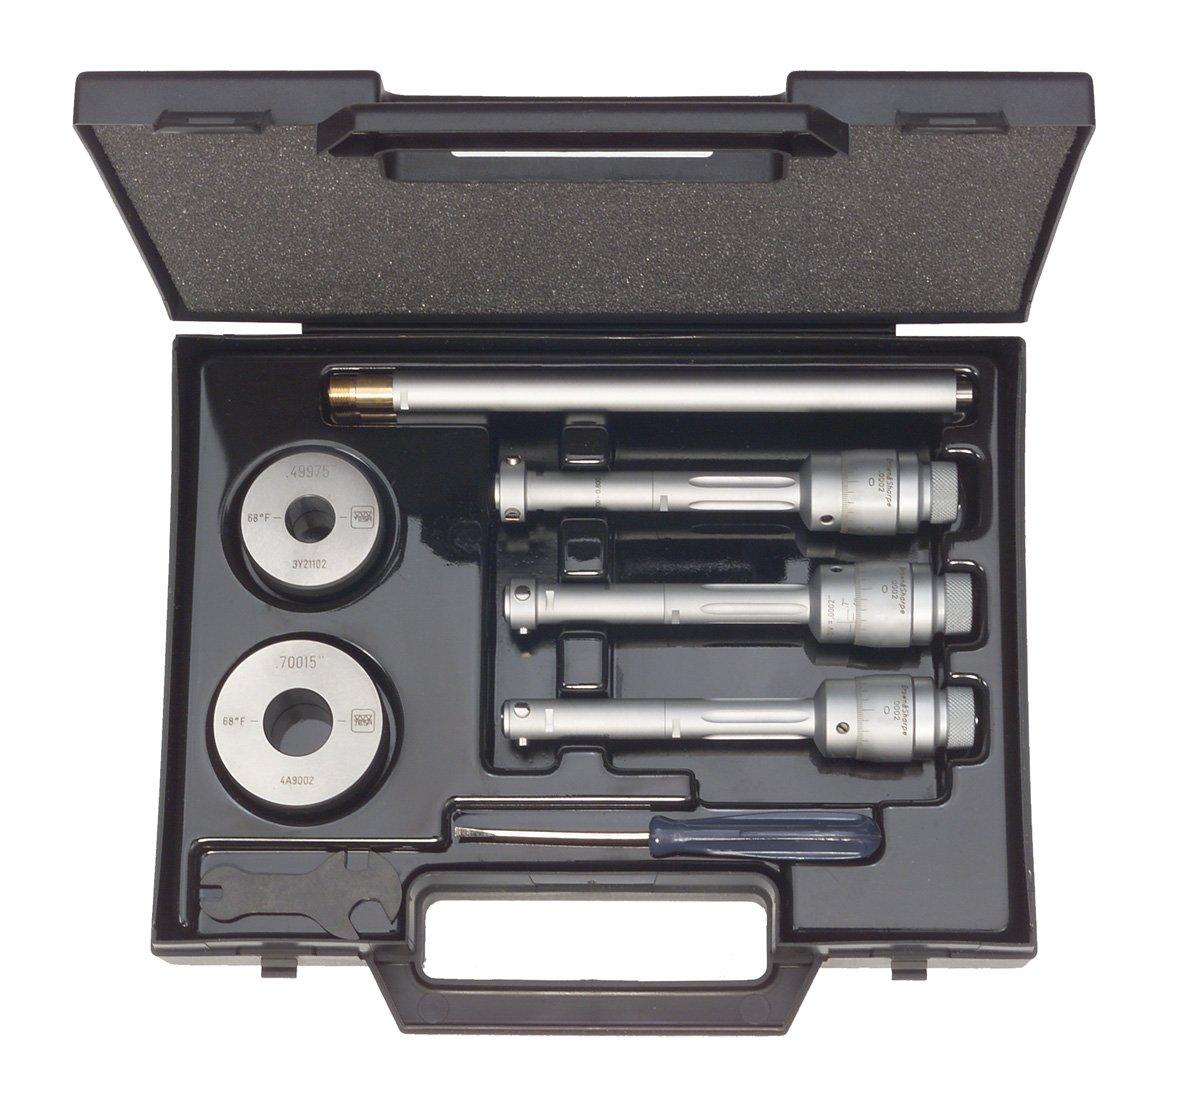 6 Piece Set Brown /& Sharpe 00880400 Intrimik Analog Inside Micrometer Set 0.0002 Graduation +//-0.00016 Accuracy 0.5-0.8 Range